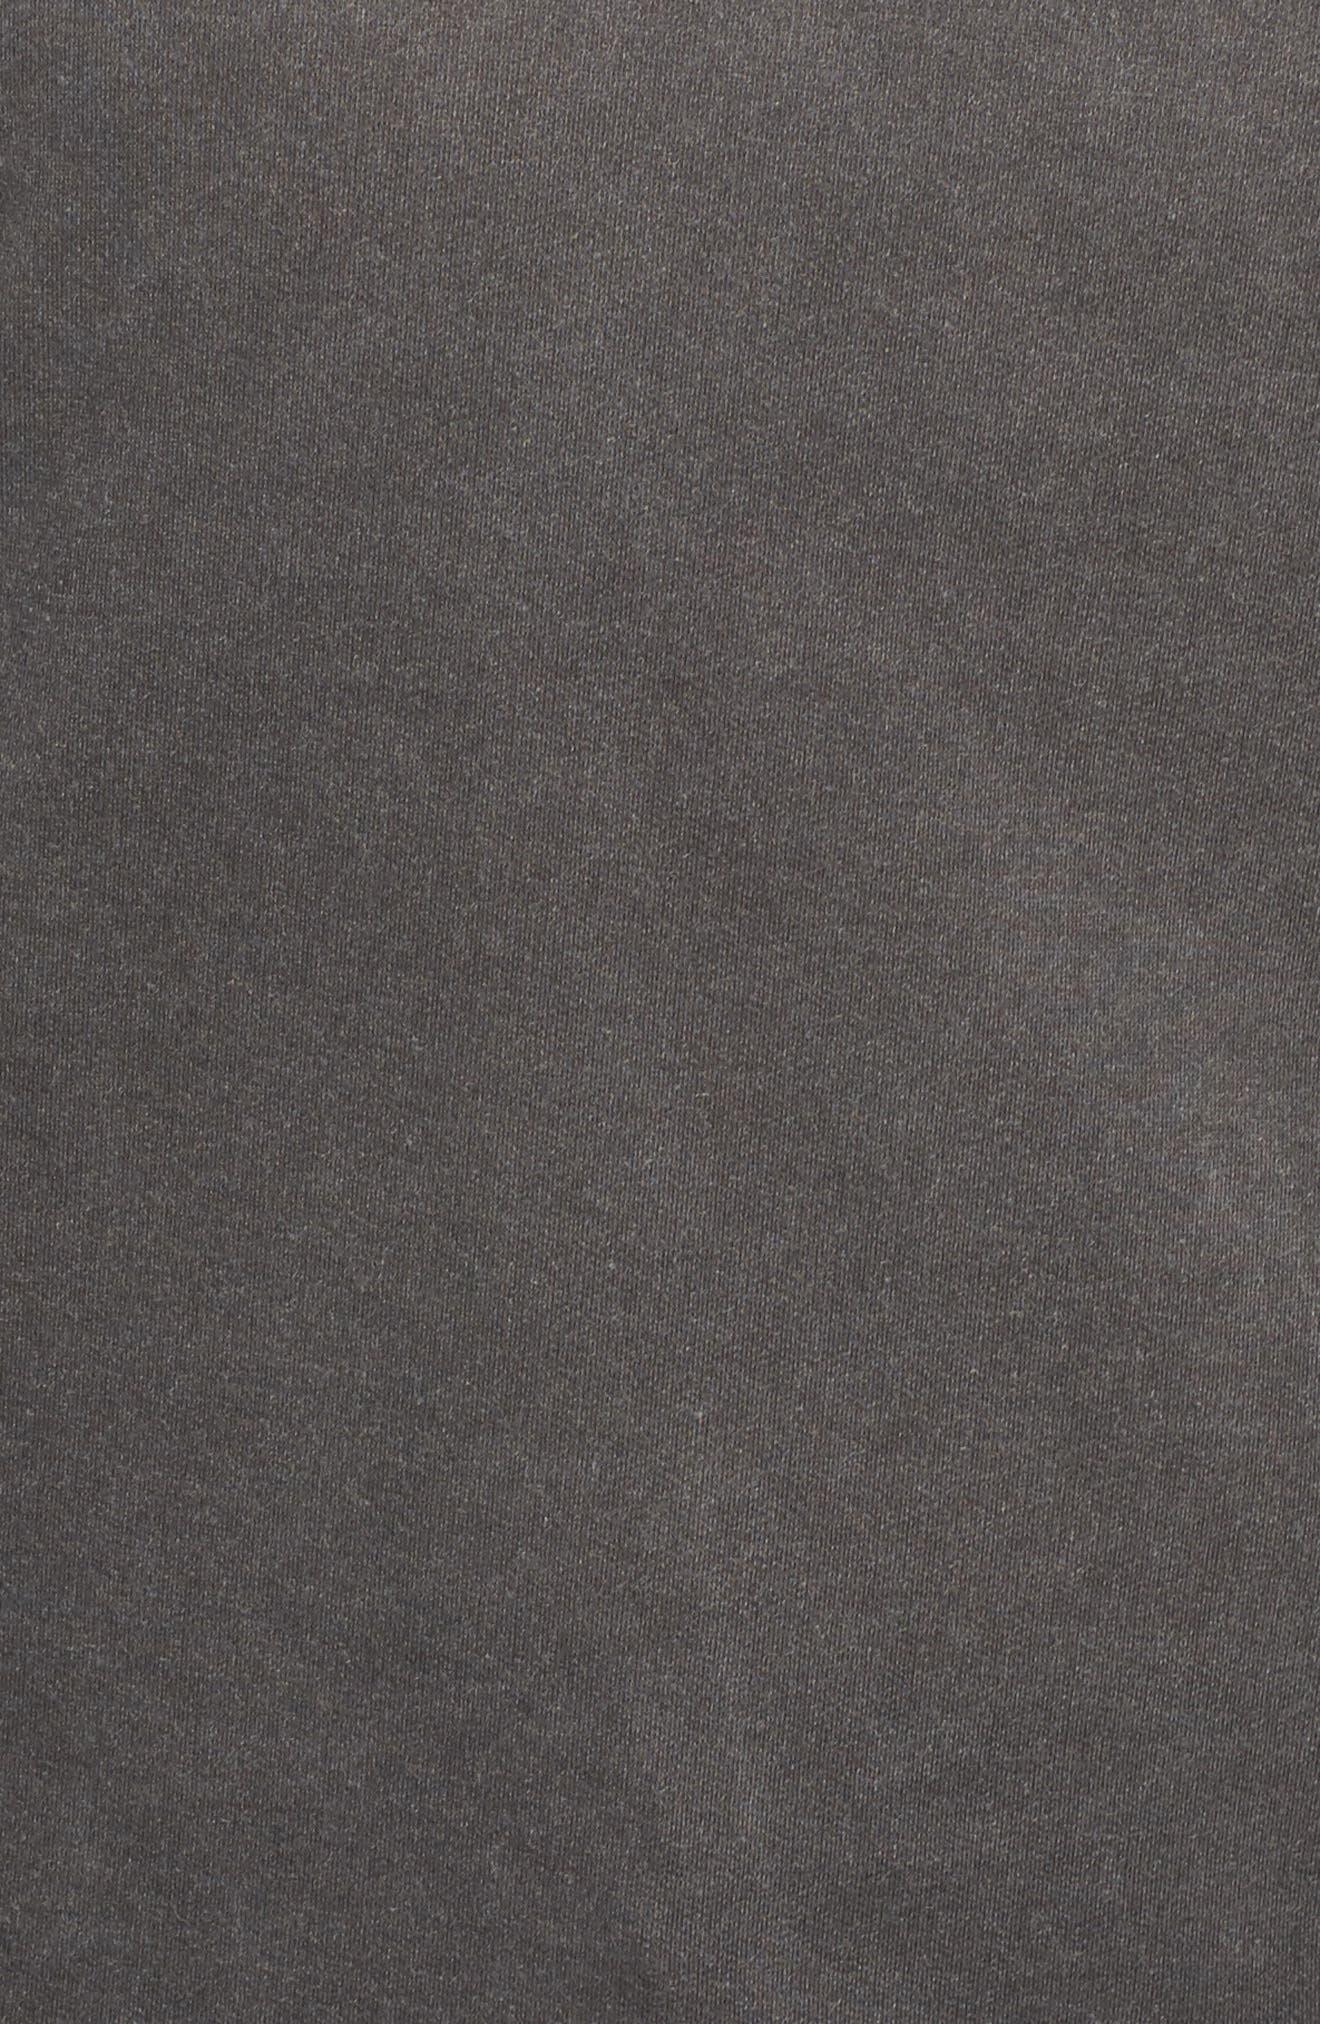 Dolman Sleeve Top,                             Alternate thumbnail 5, color,                             001